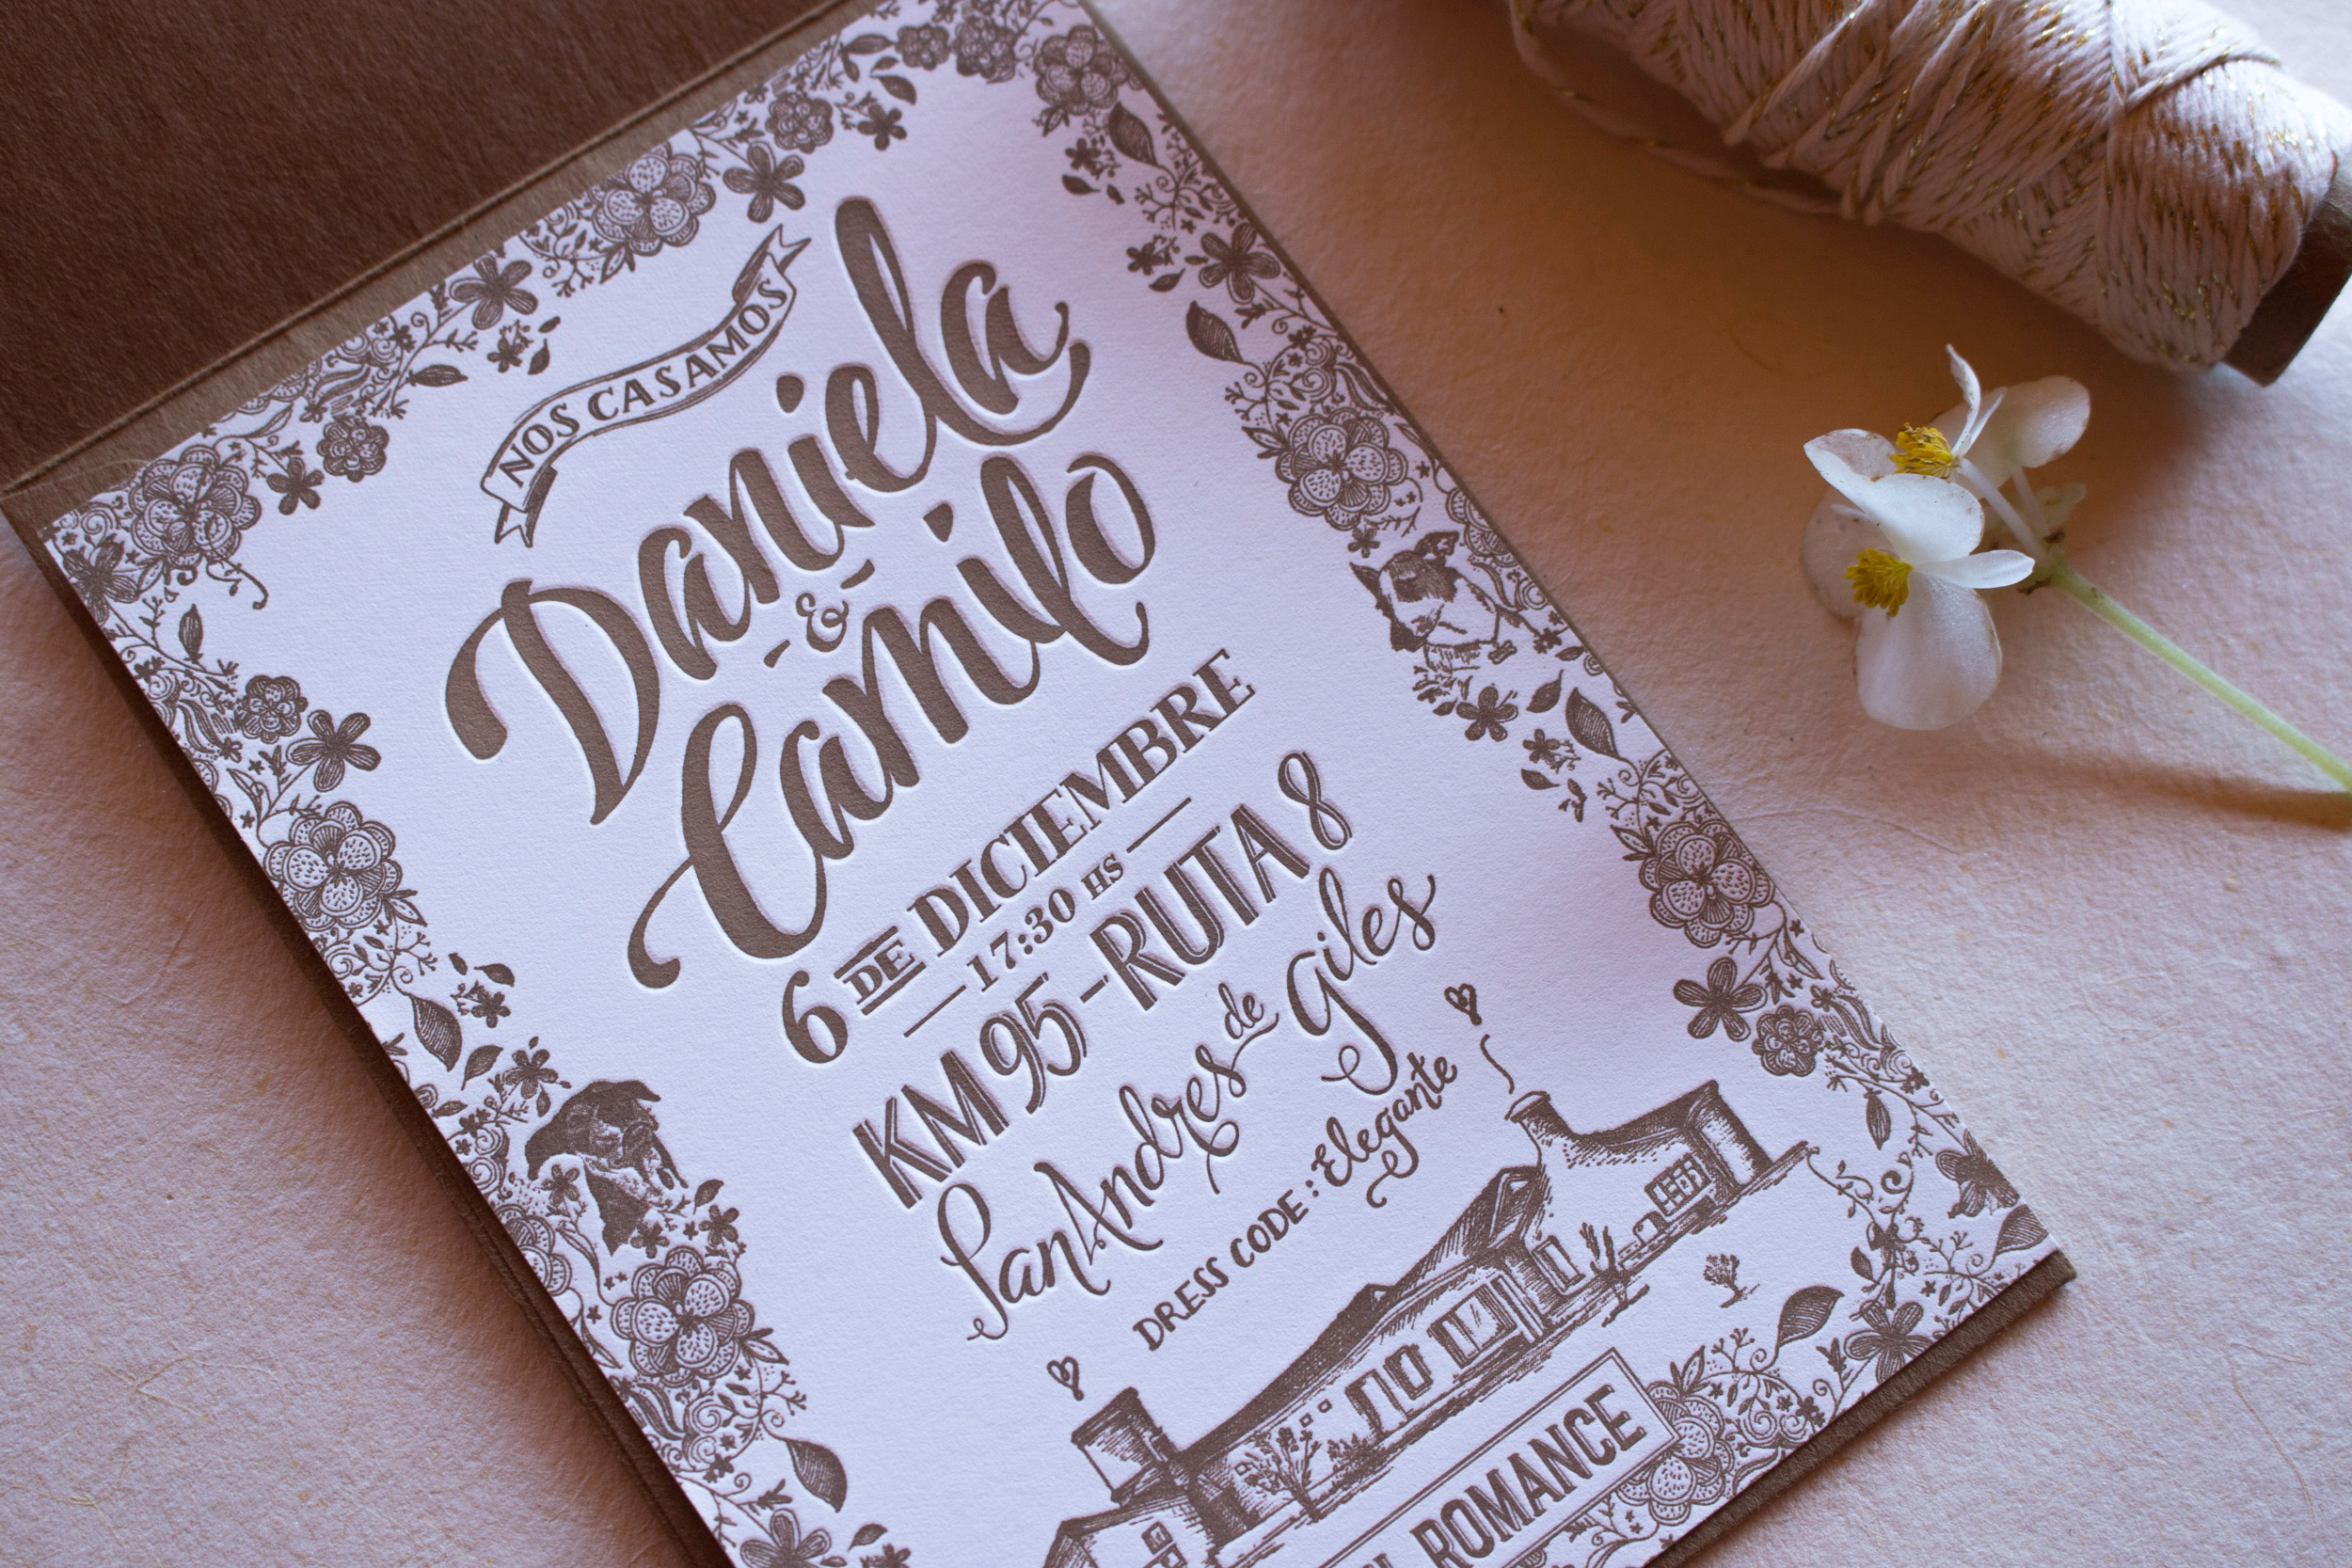 tarjetas-invitaciones-daniela&camilo-papel-principal-letterpress-imprenta-tipografica-1.jpg